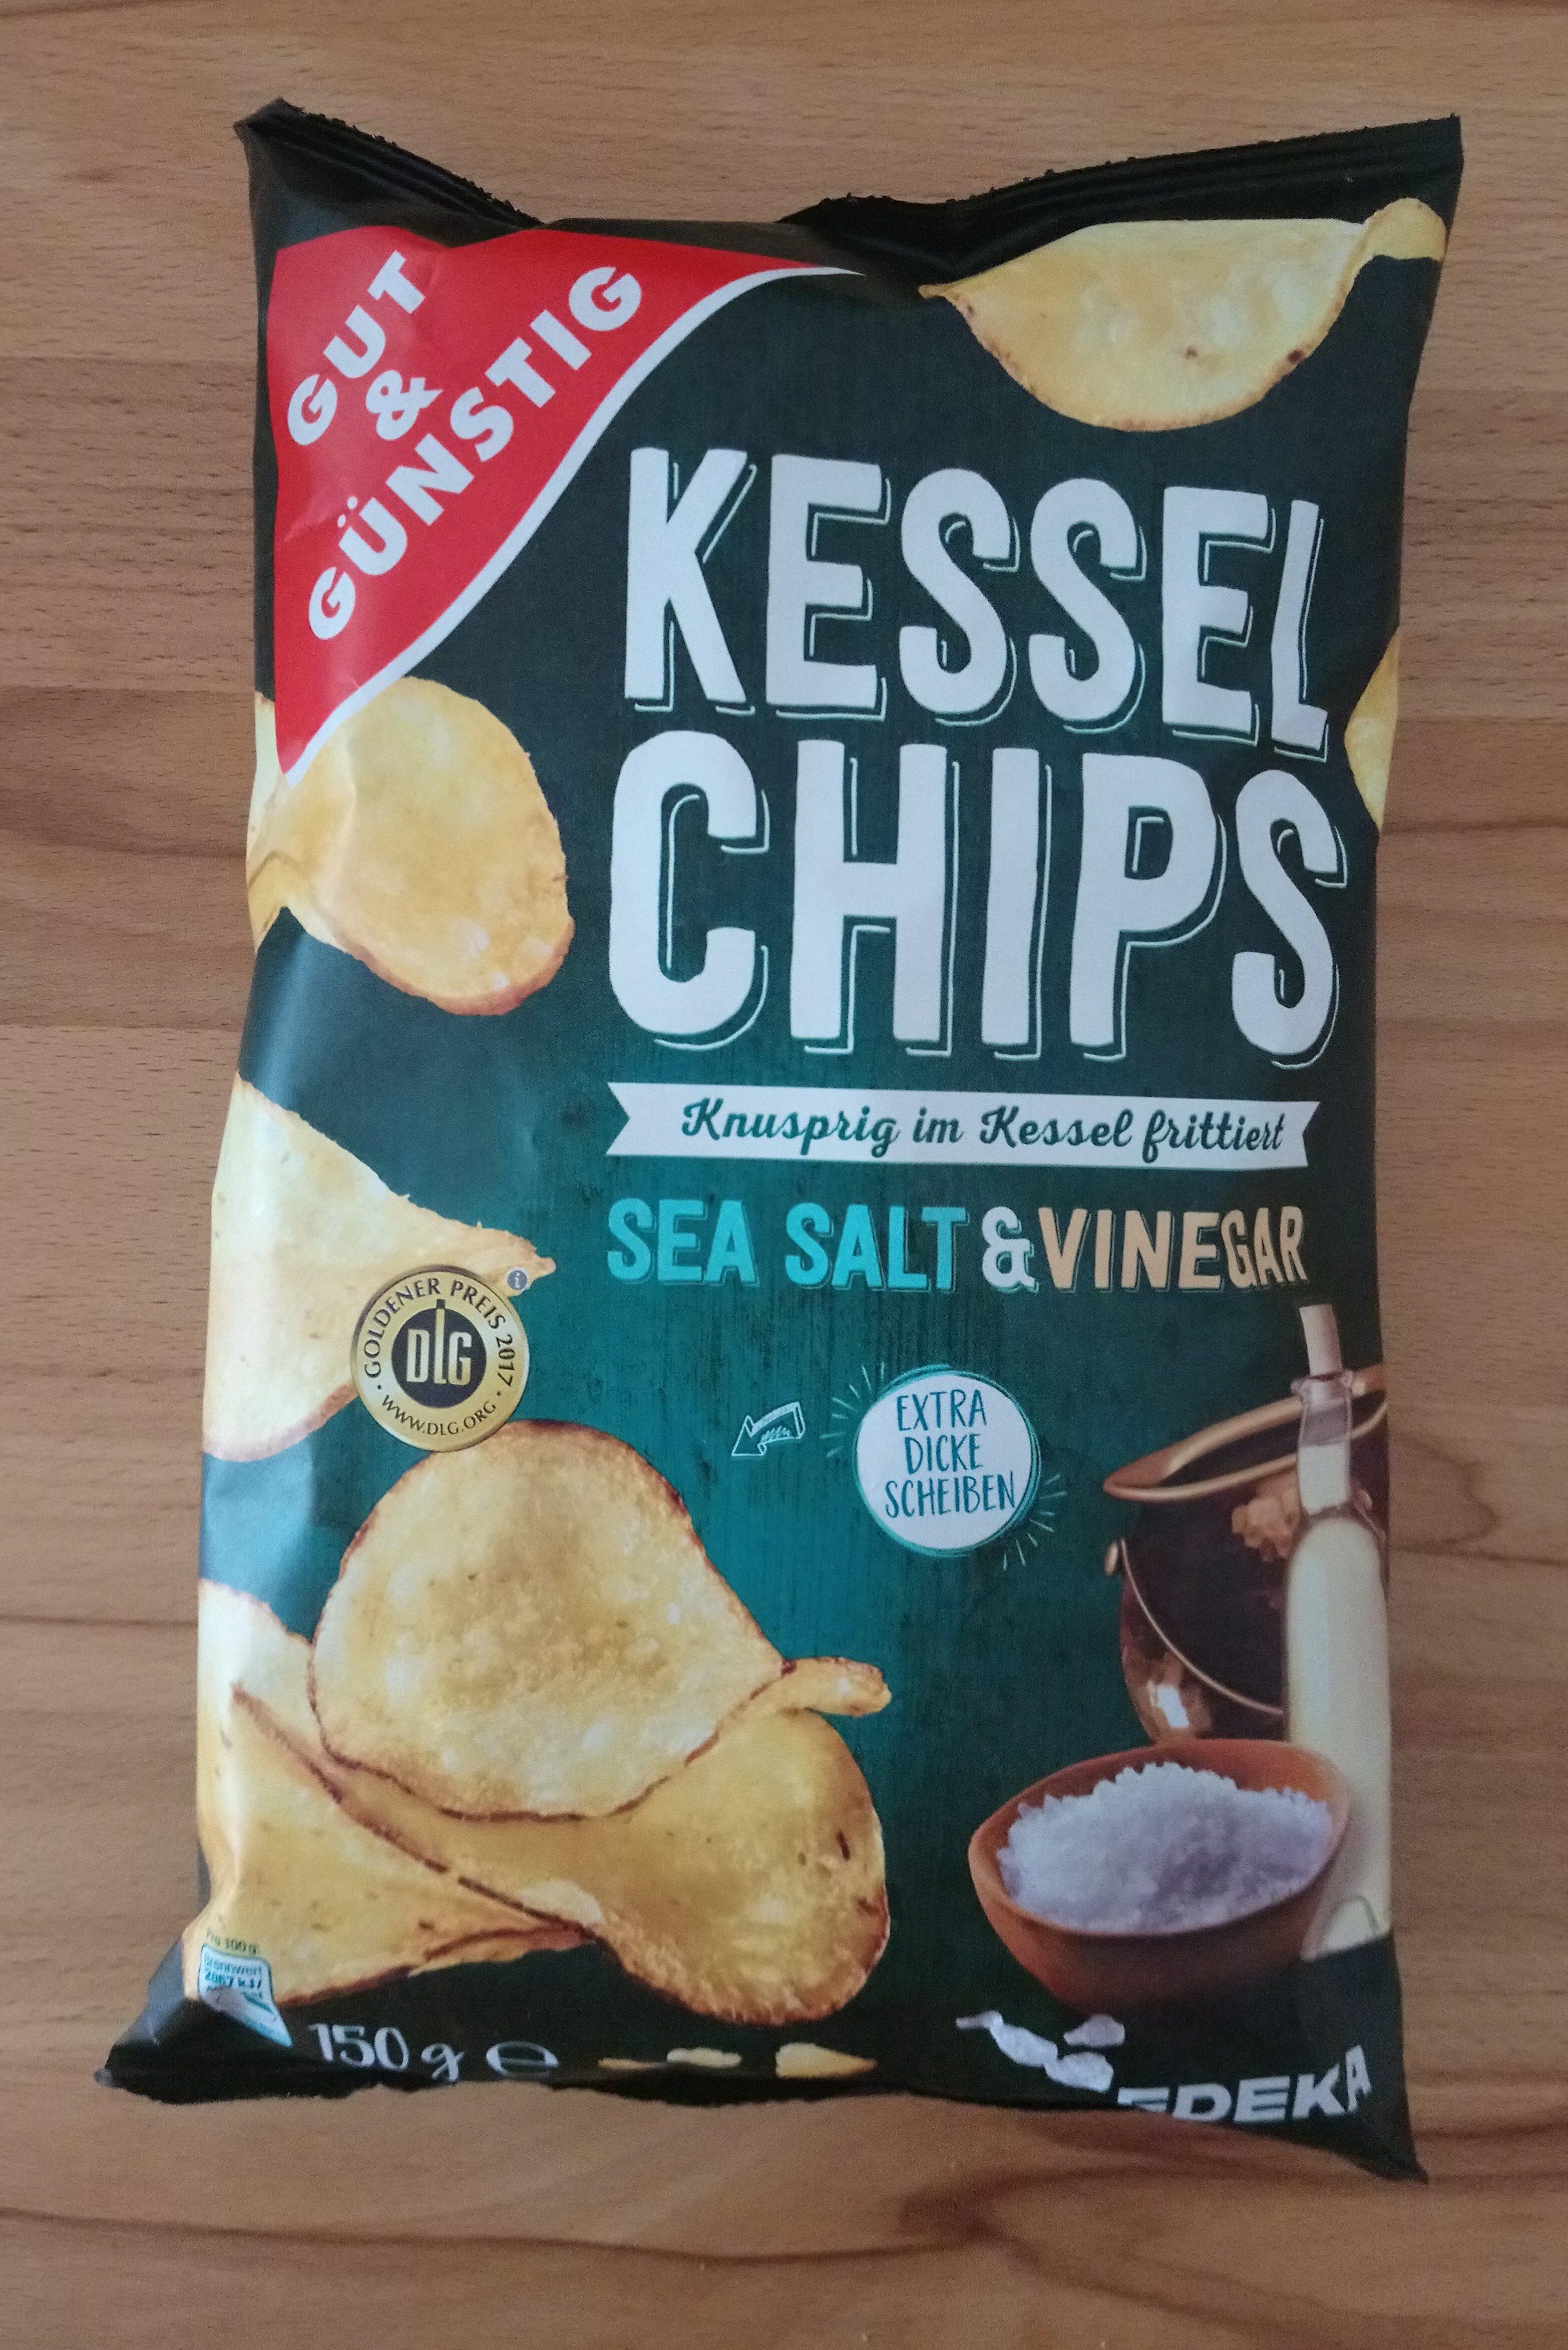 Kesselchips Sea Salt & Vinegar - Produit - de